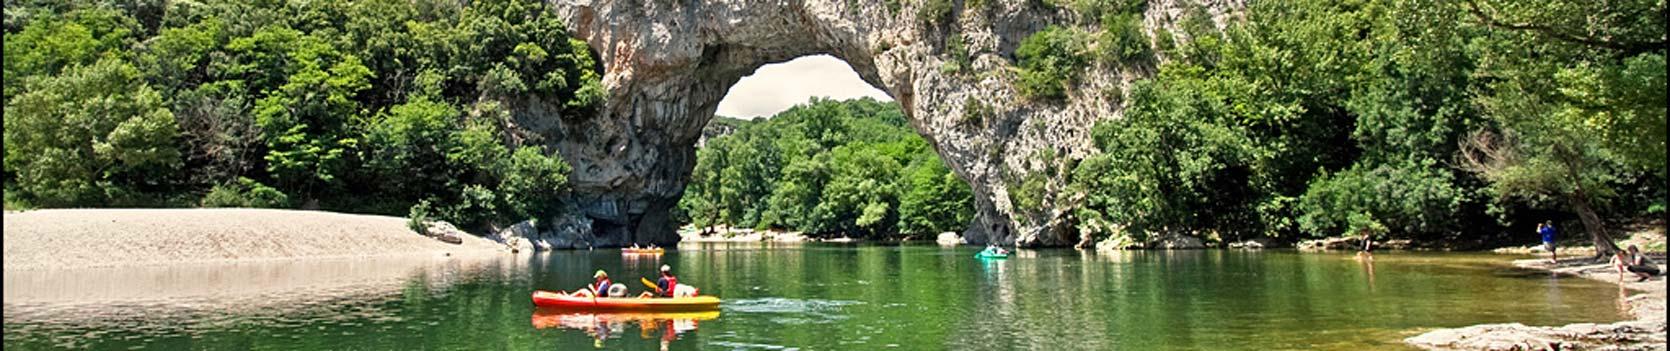 camping bord de riviere saint privat